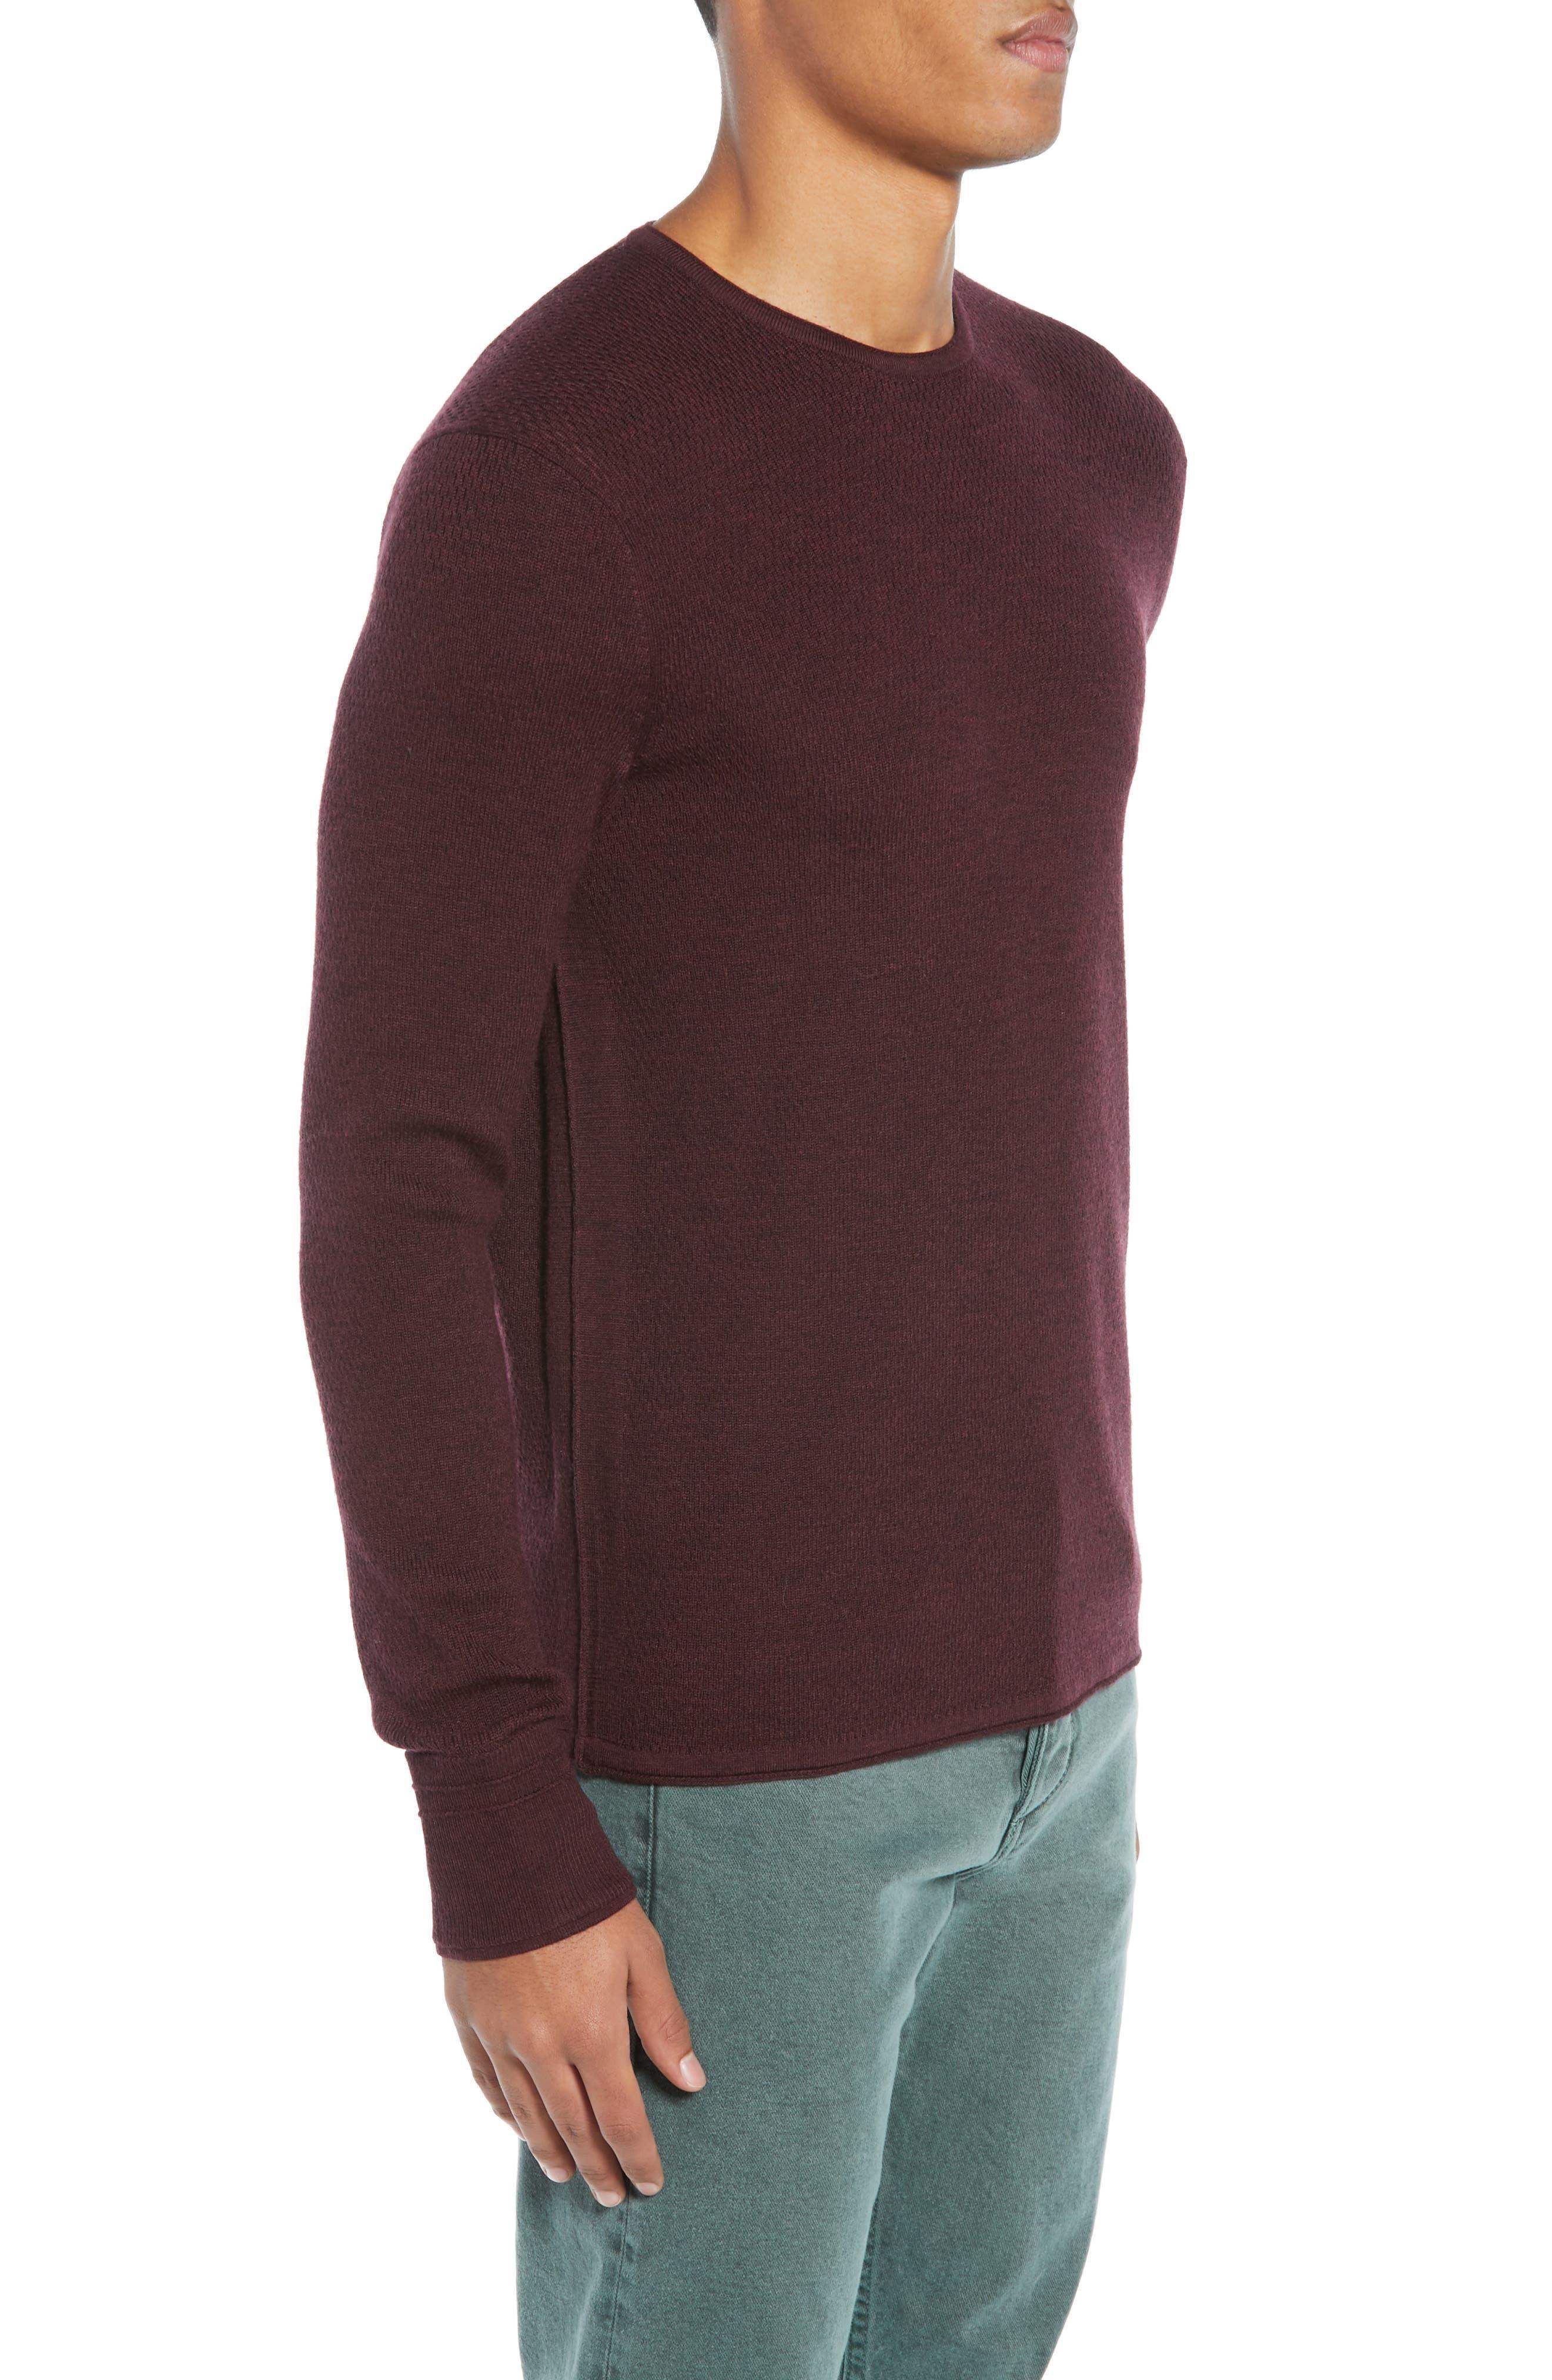 Gregory Merino Wool Blend Crewneck Sweater,                             Alternate thumbnail 3, color,                             BURGUNDY